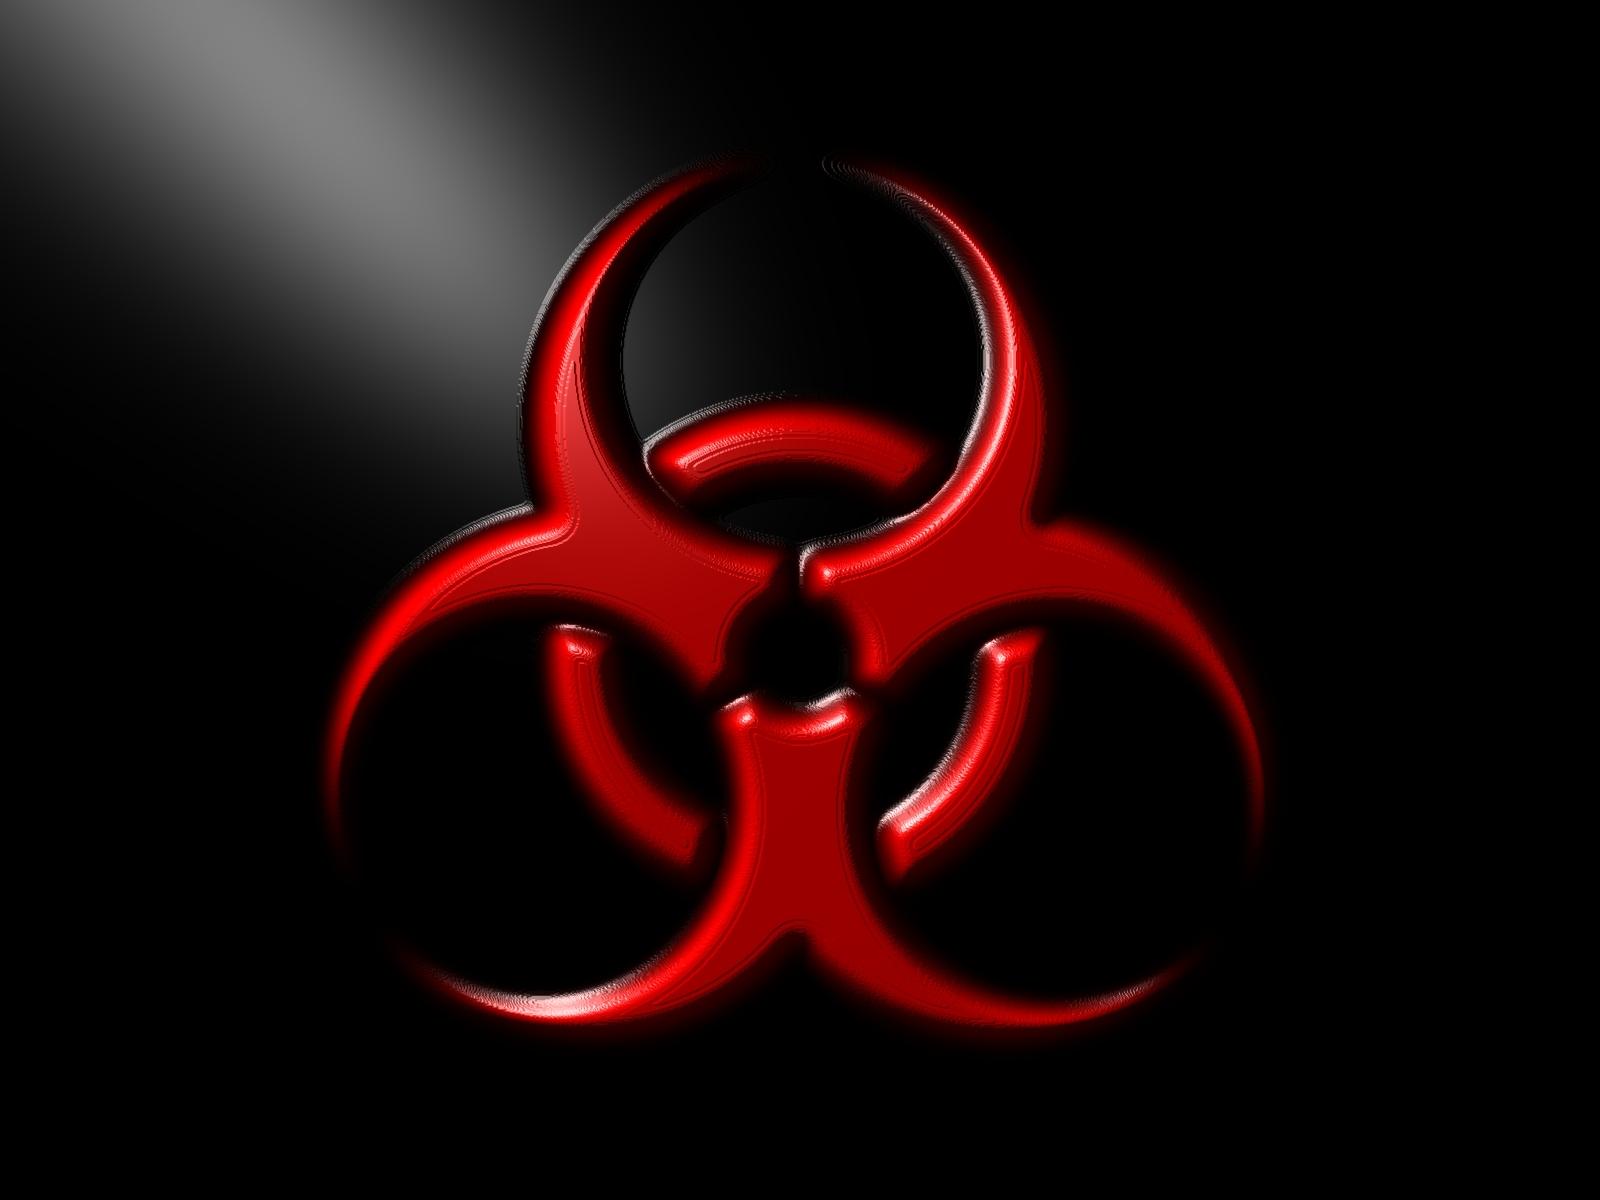 Biohazard Symbol Background Download Wallpapercraft 1600x1200